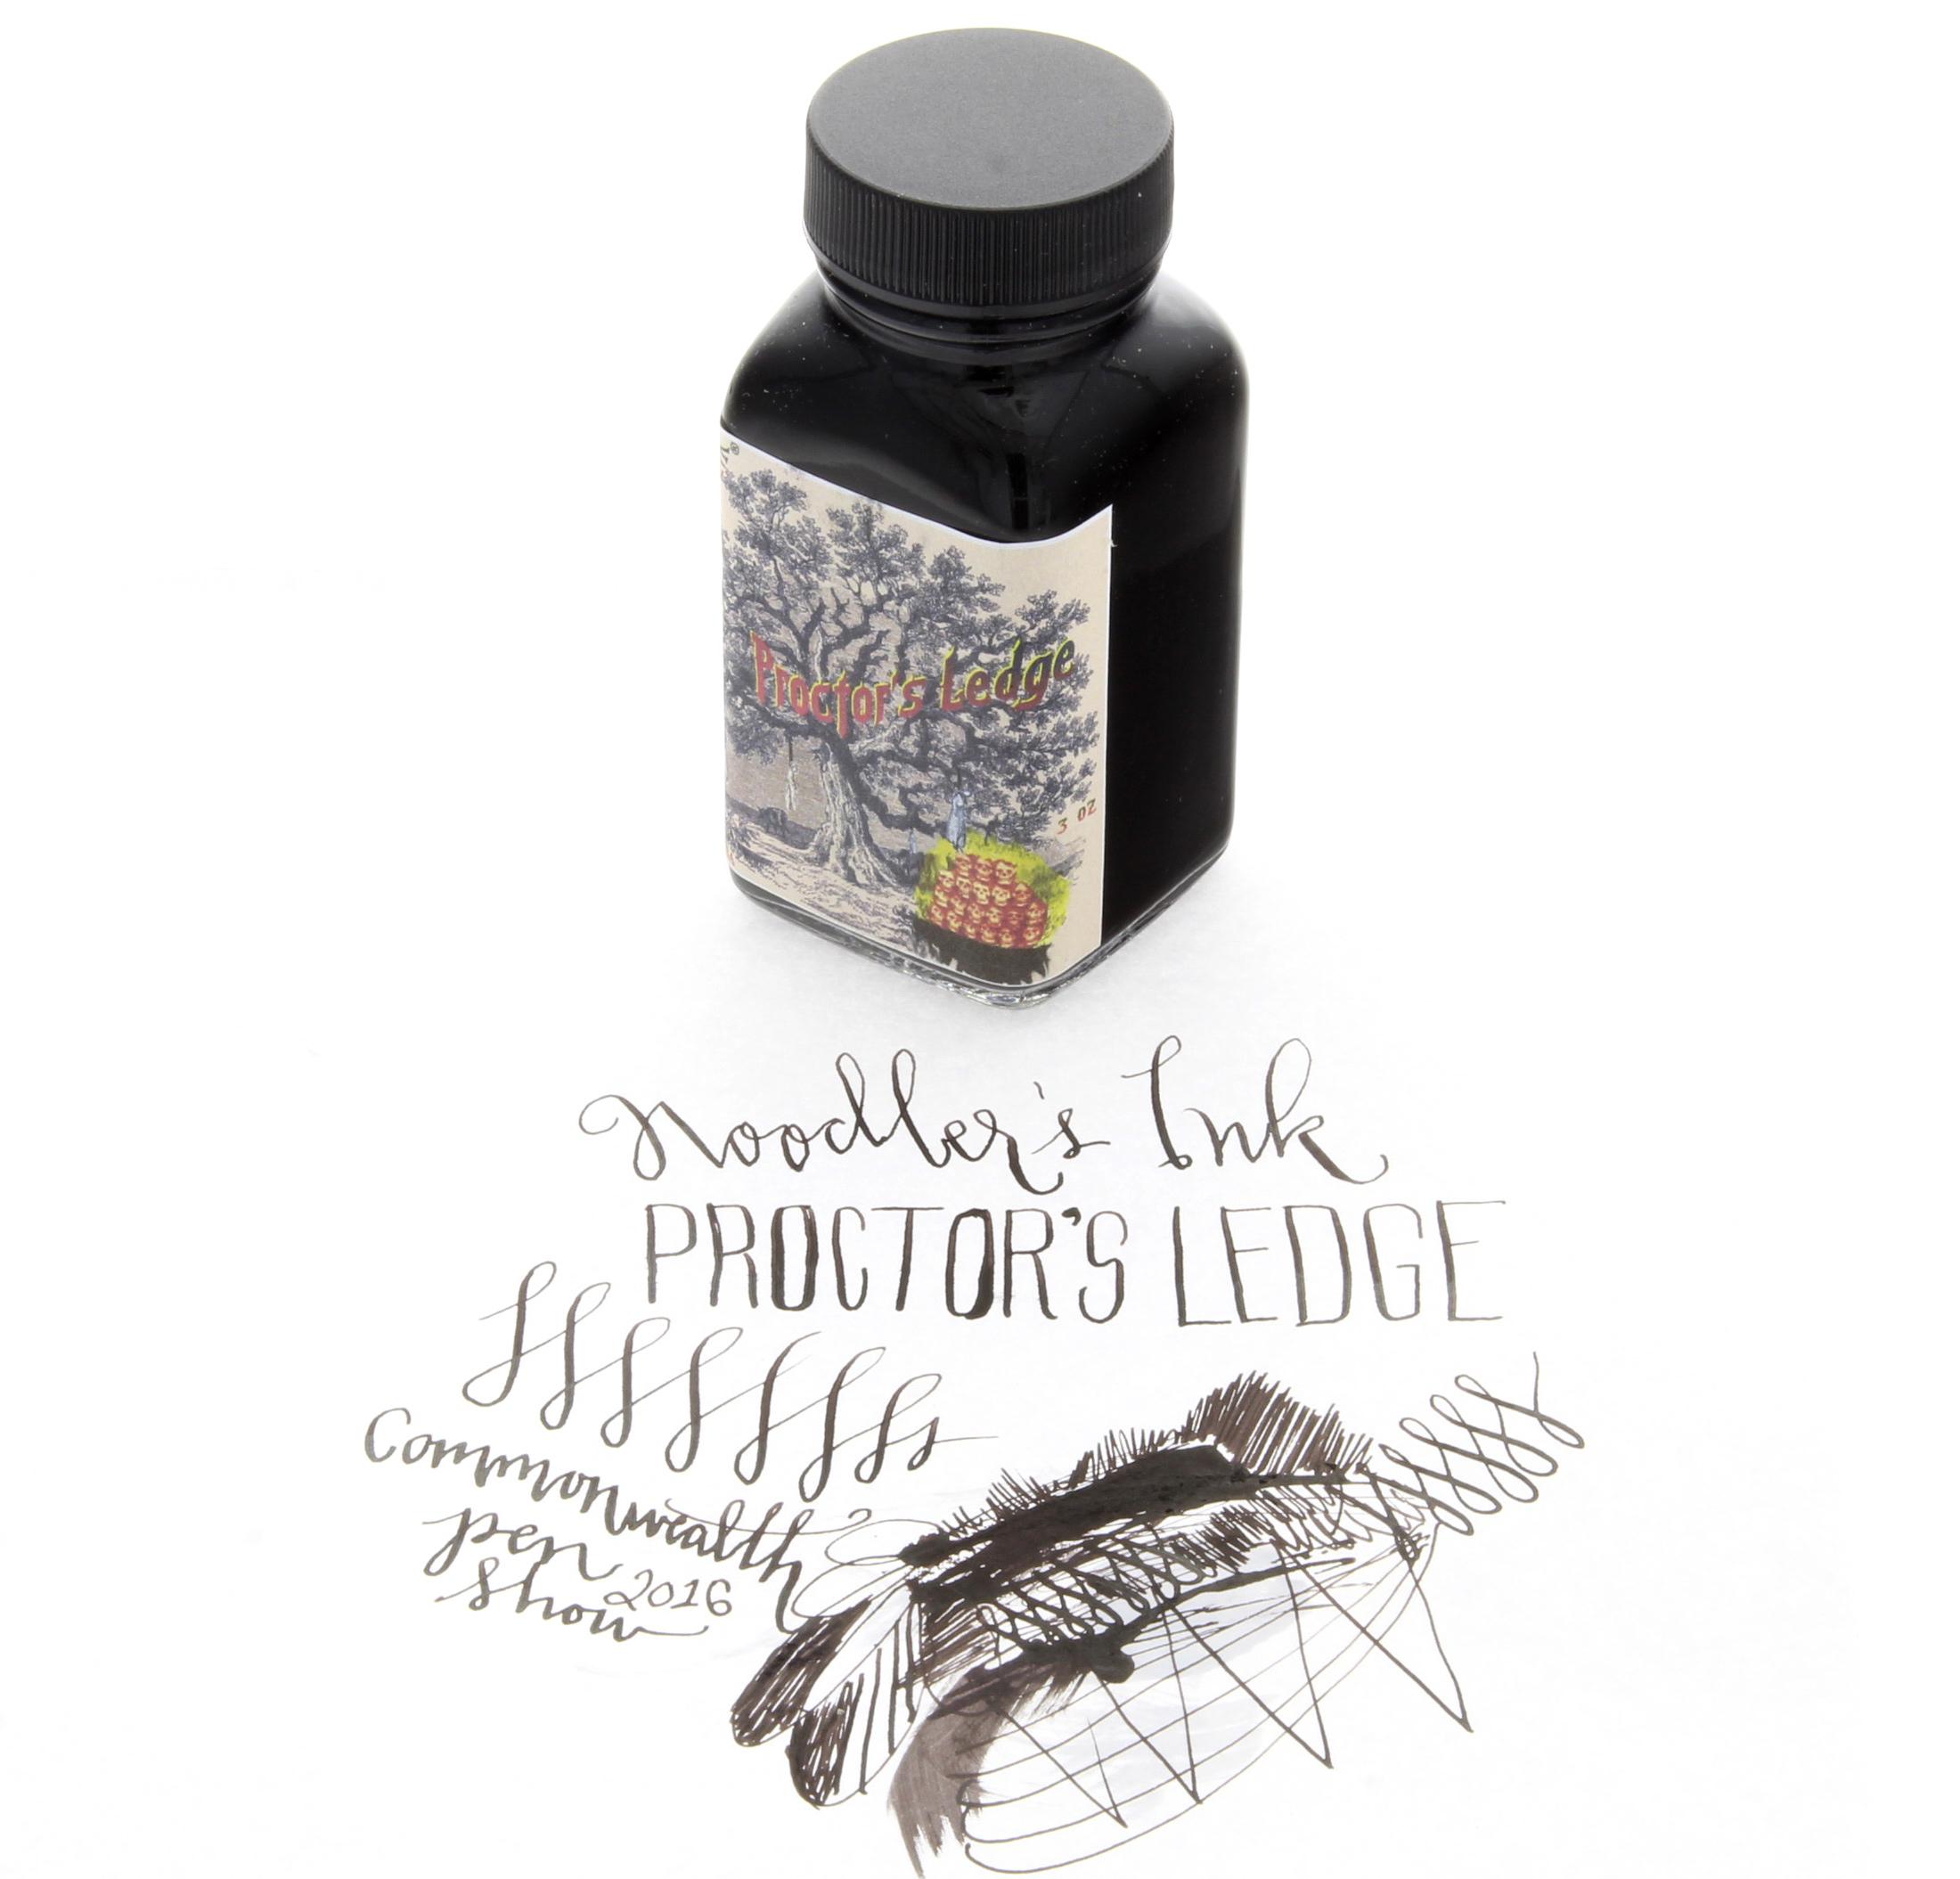 Noodlers Ink Proctors Ledge Review